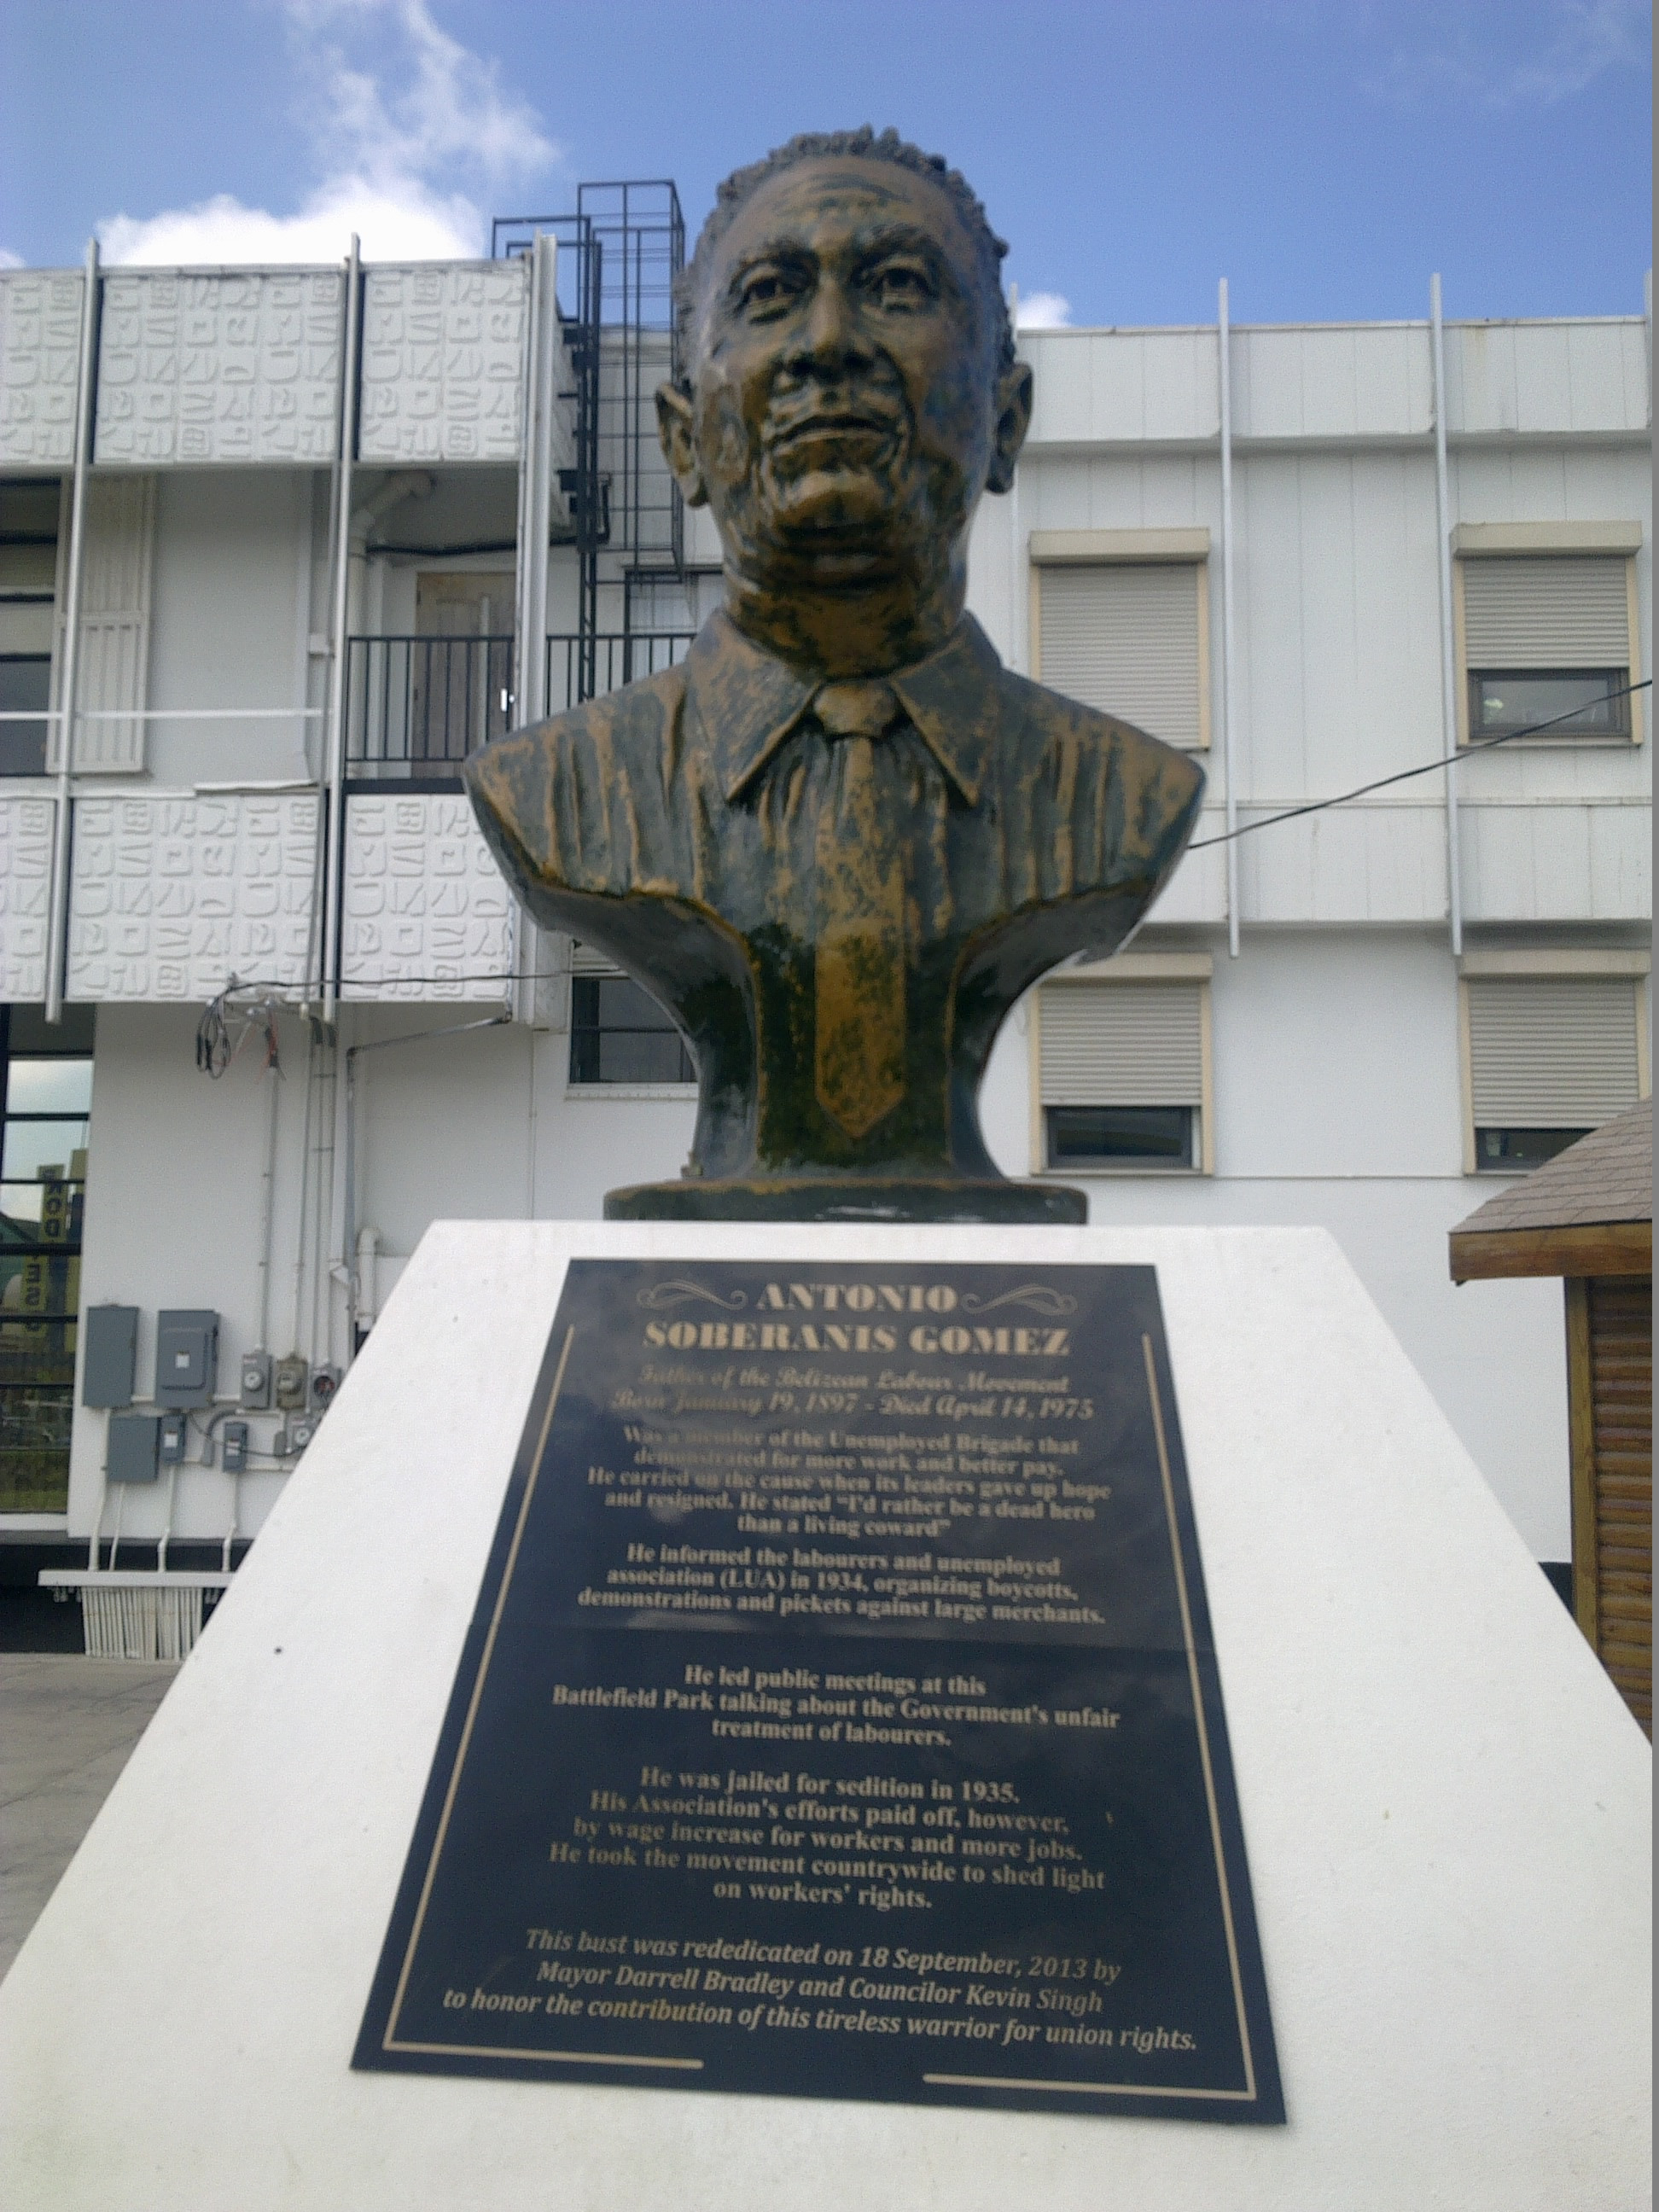 Antonio Soberanis Gómez (Belize City)